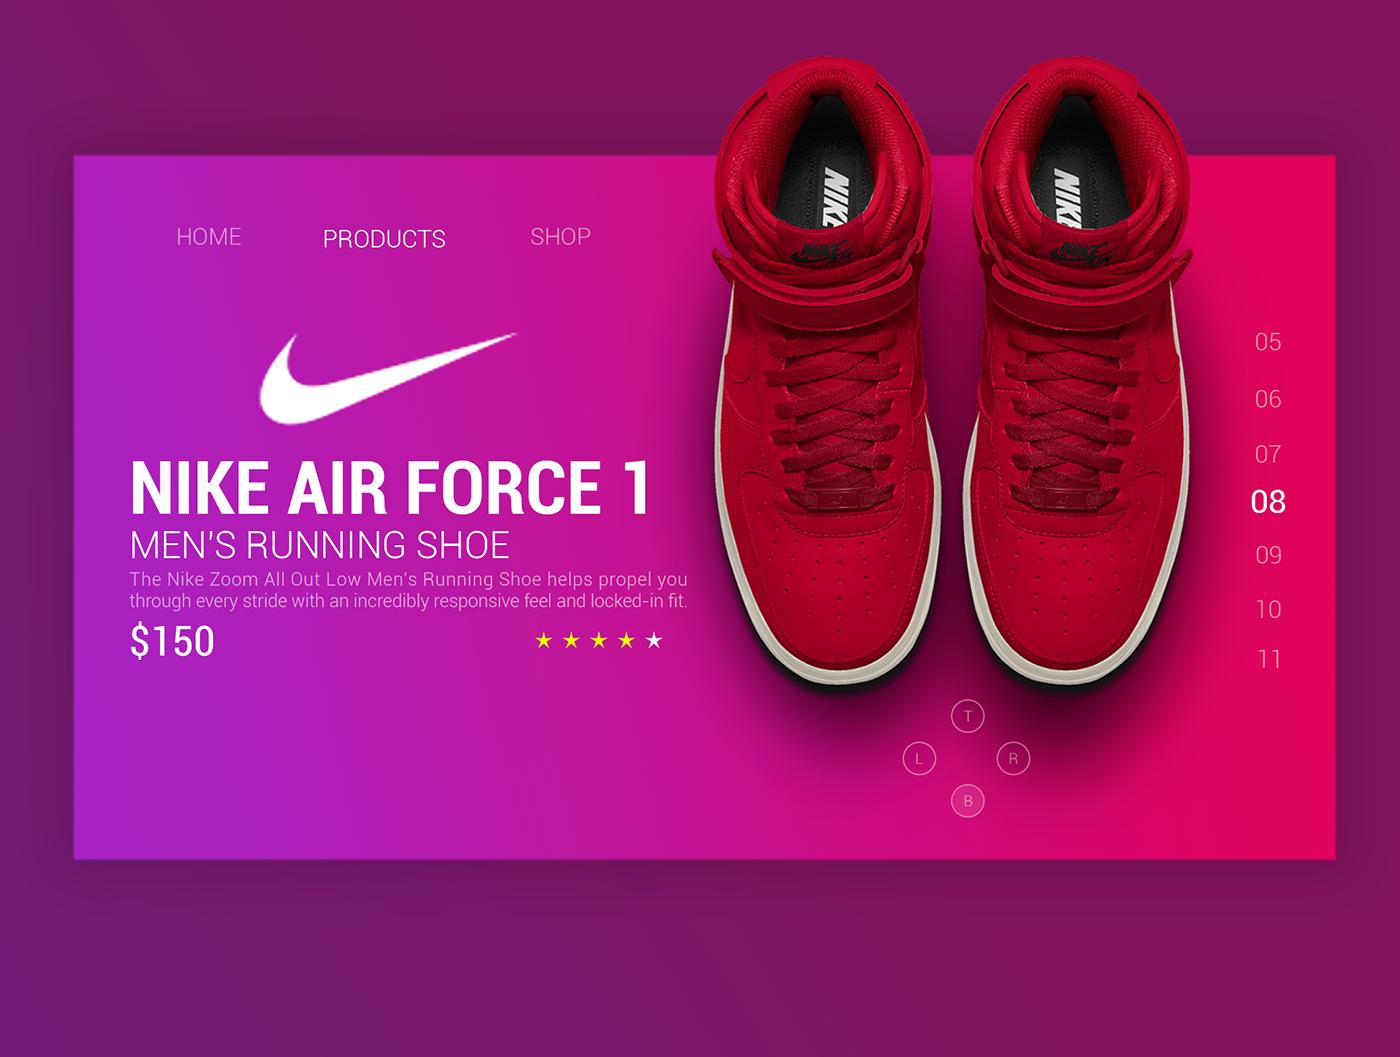 Tengo una clase de ingles Ortografía Desaparecido  Nike web design - Inspiration from Ranjith Alingal on Behance